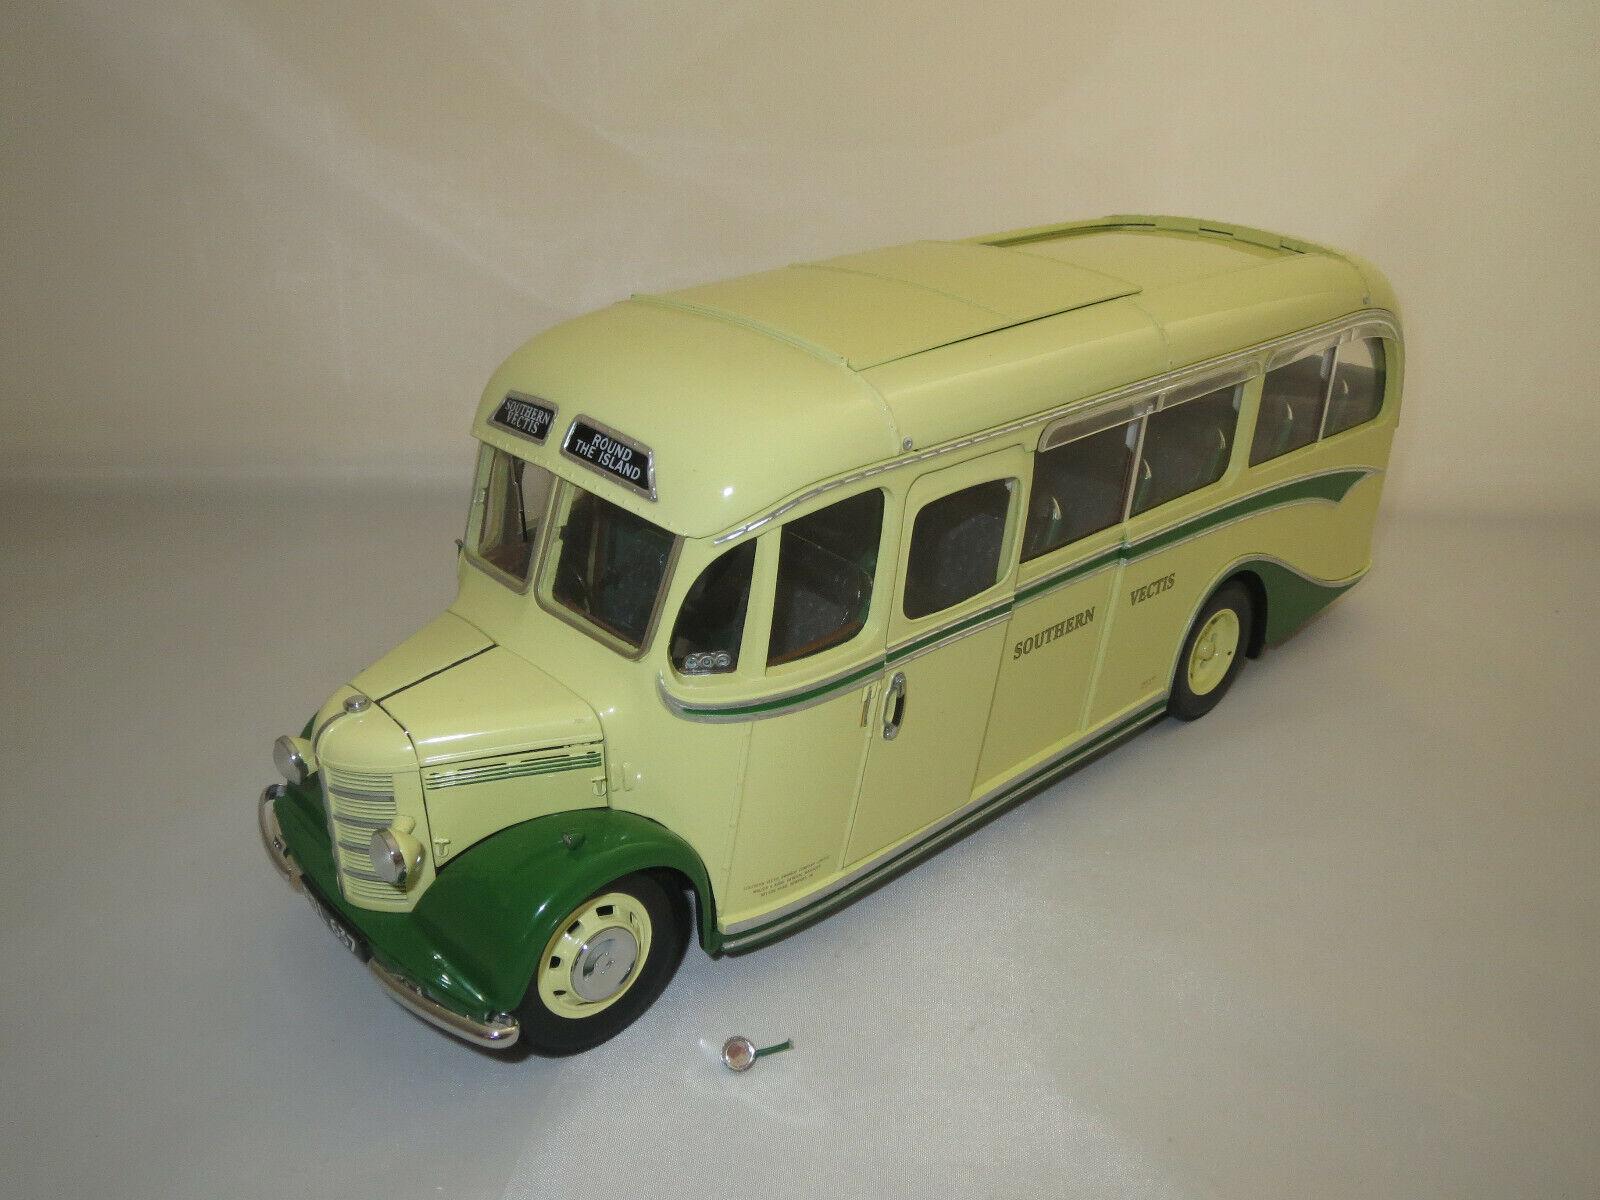 SUN STAR 5002 Bedford si (jaune vert) 1 24 neuf dans sa boîte